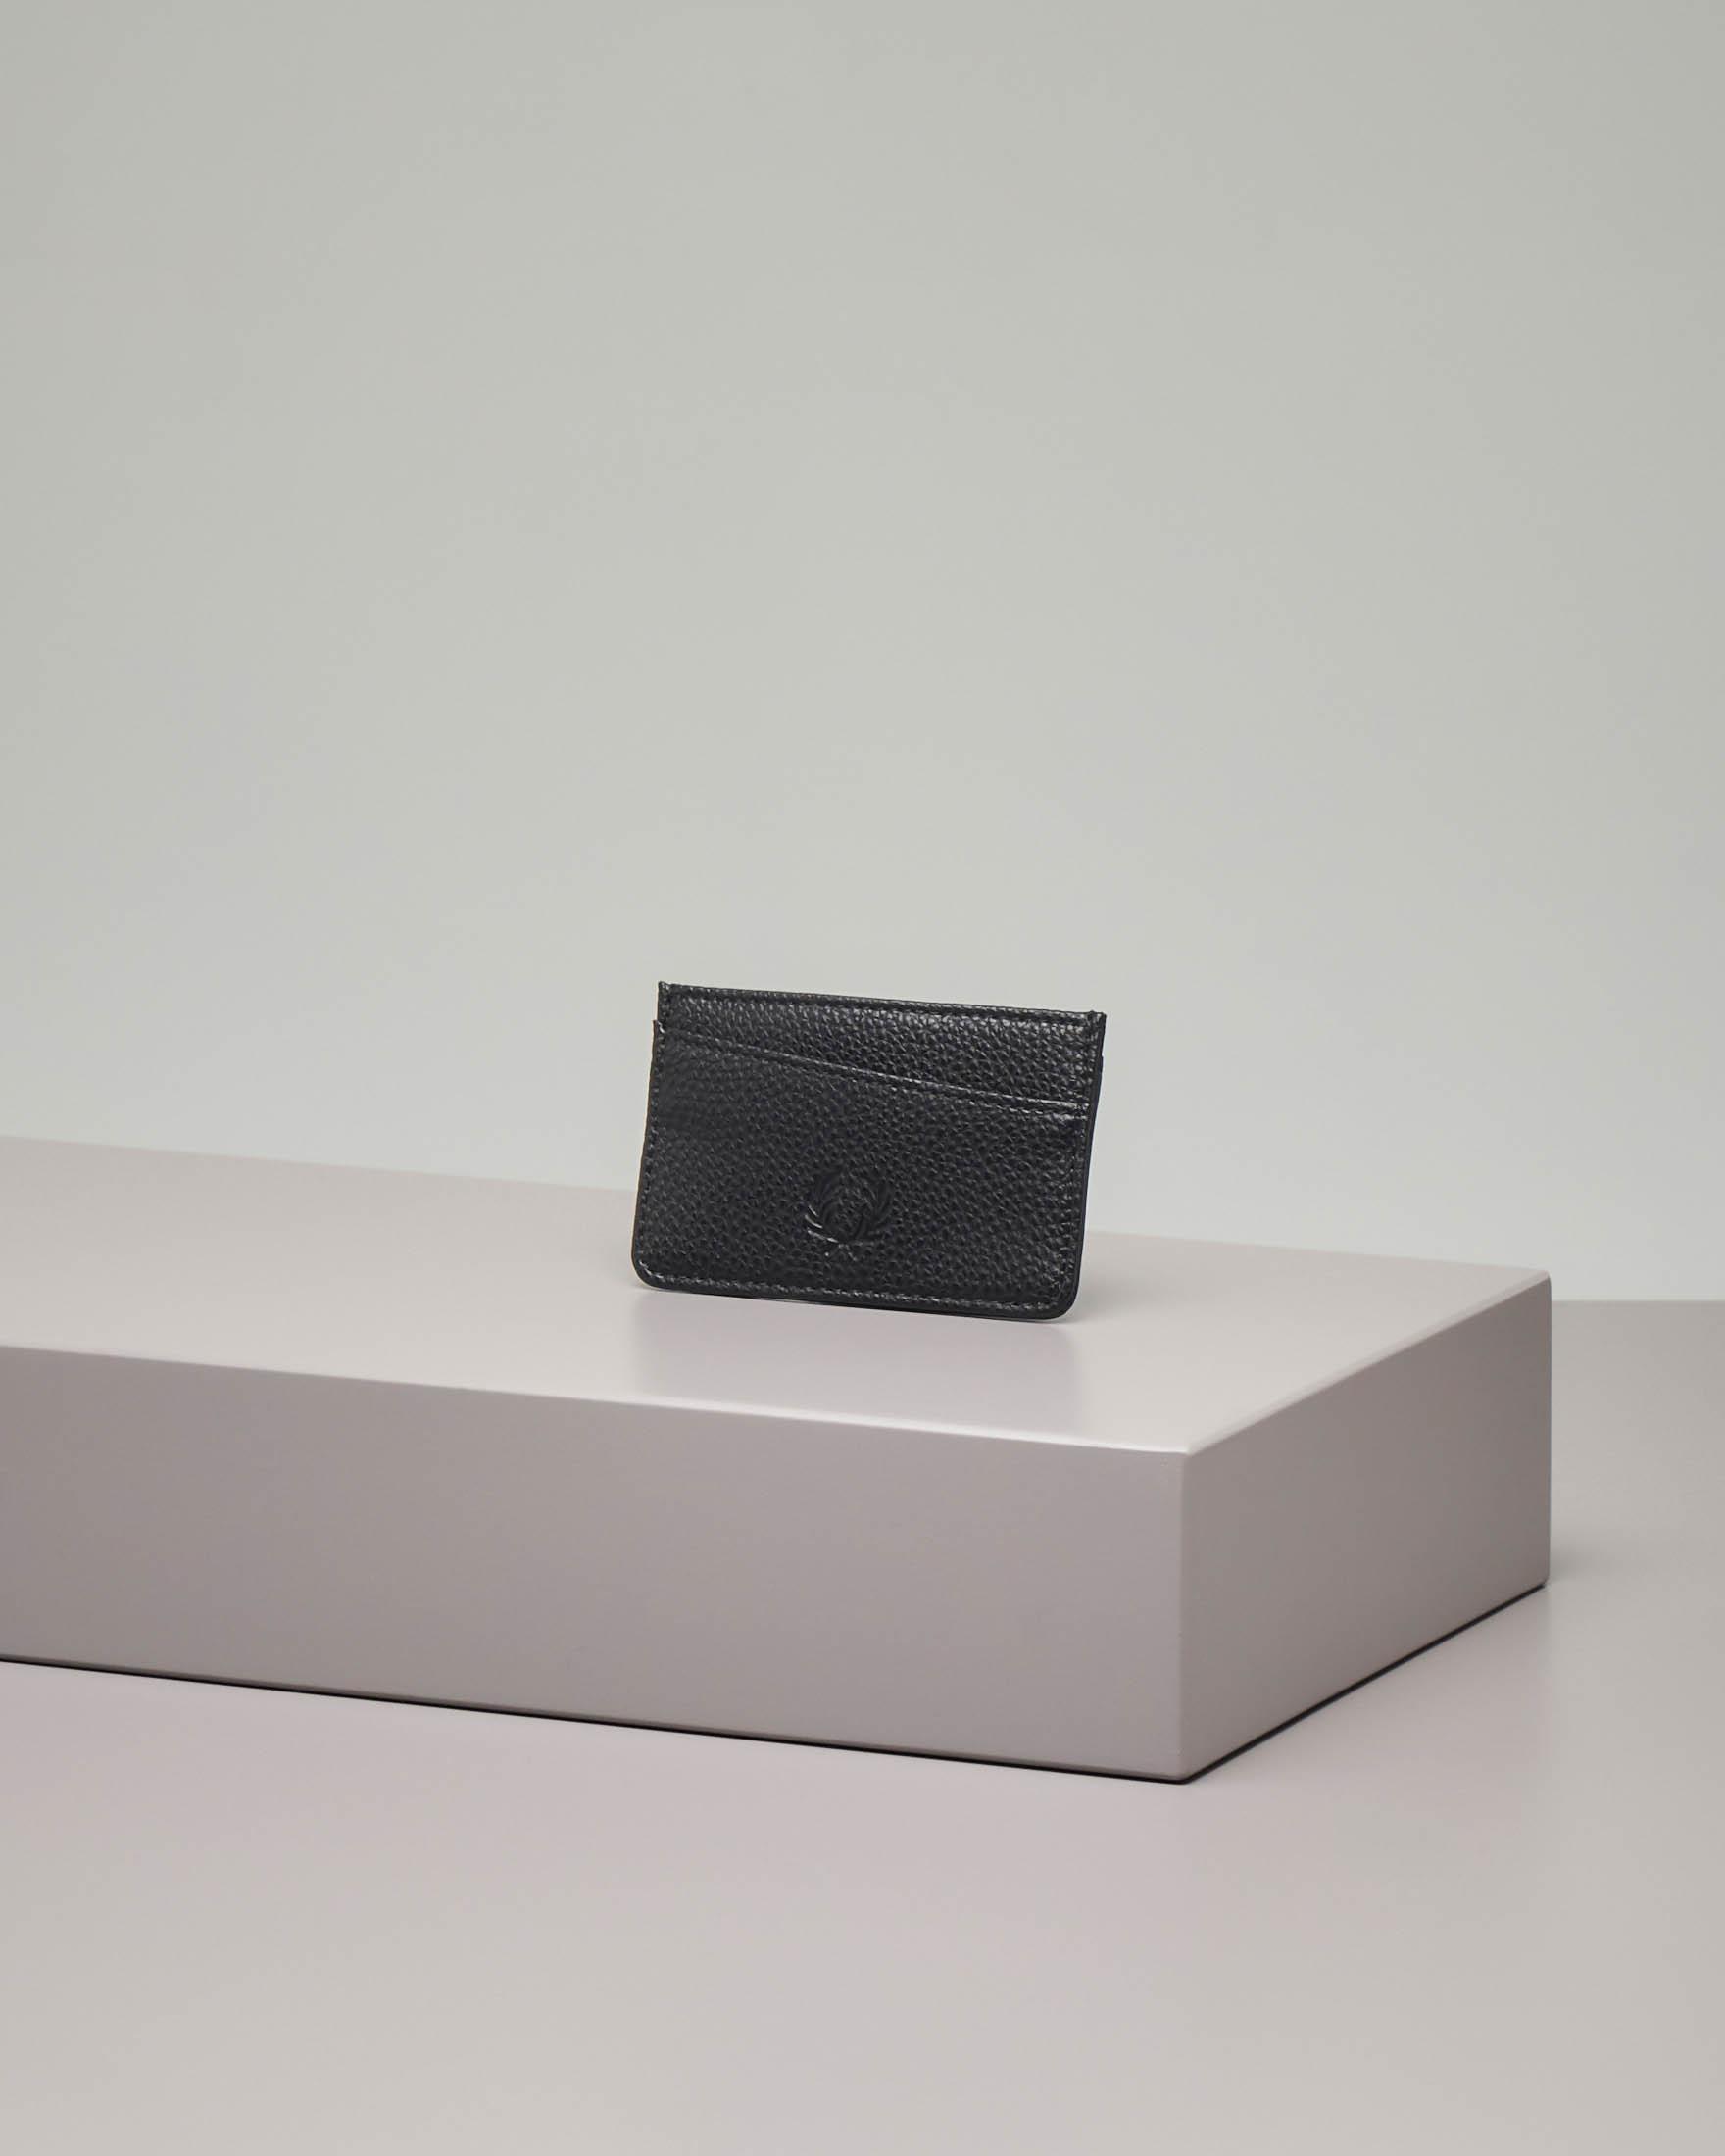 Portacarte nero in ecopelle martellata